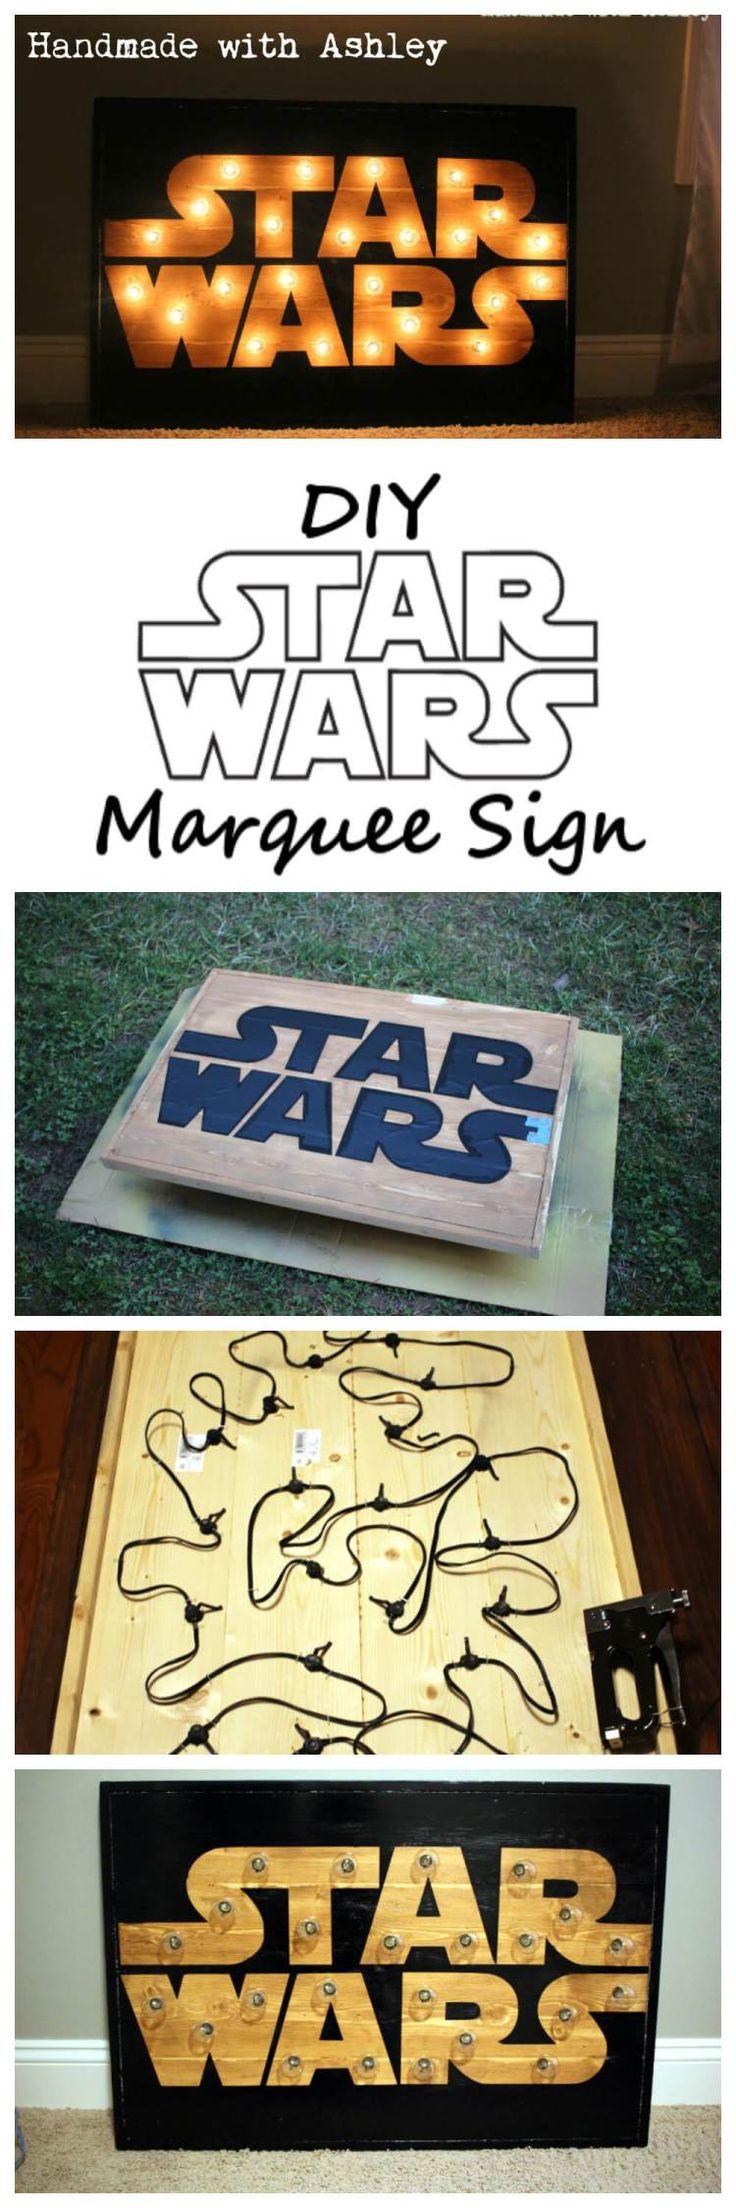 DIY Star Wars Marquee Sign Tutorial